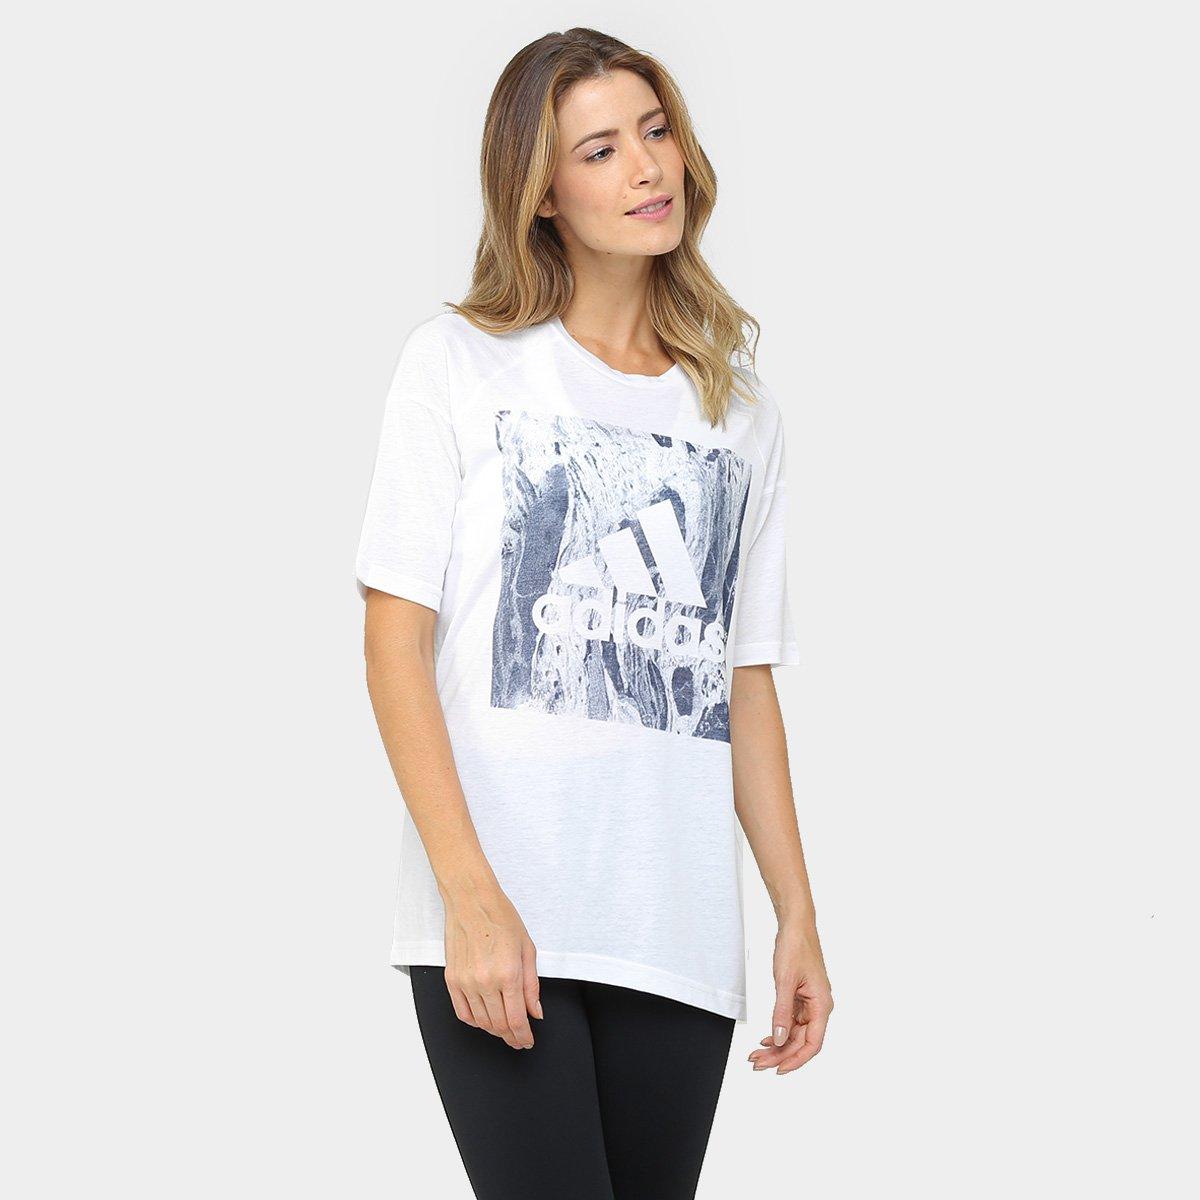 1c354fd0a07 Camiseta Adidas Boxy Sport ID Feminina - Compre Agora